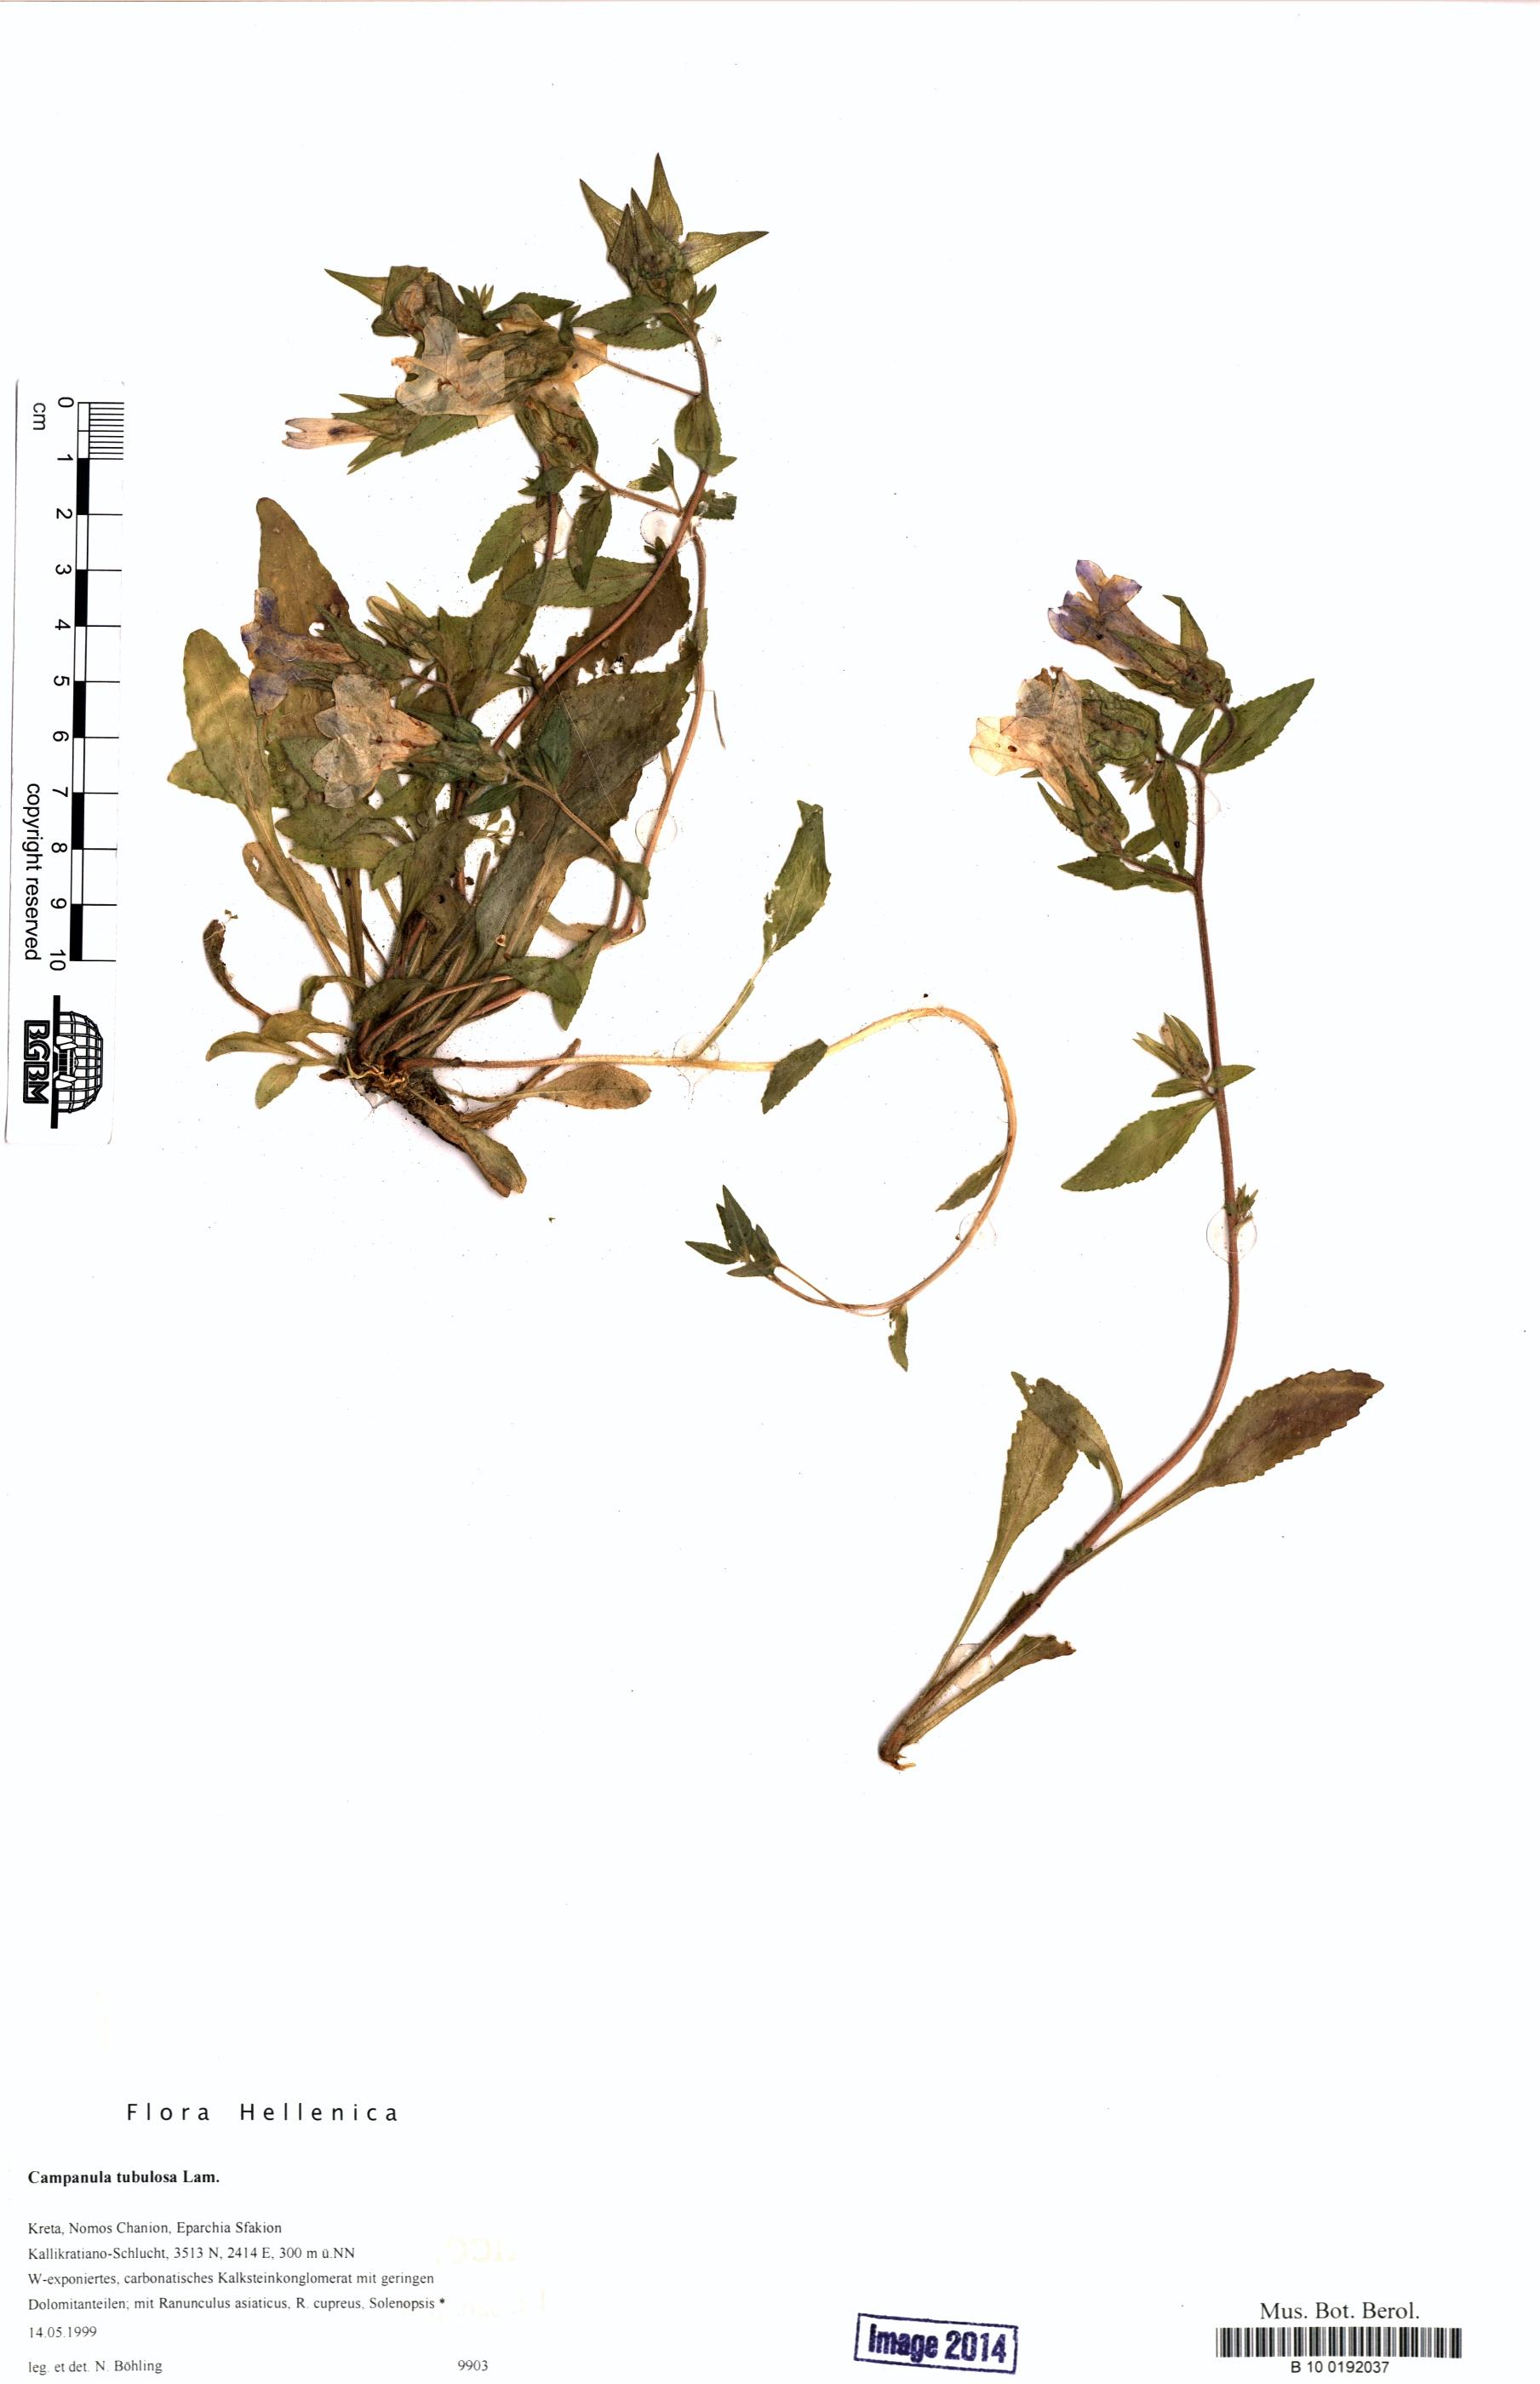 http://ww2.bgbm.org/herbarium/images/B/10/01/92/03/B_10_0192037.jpg